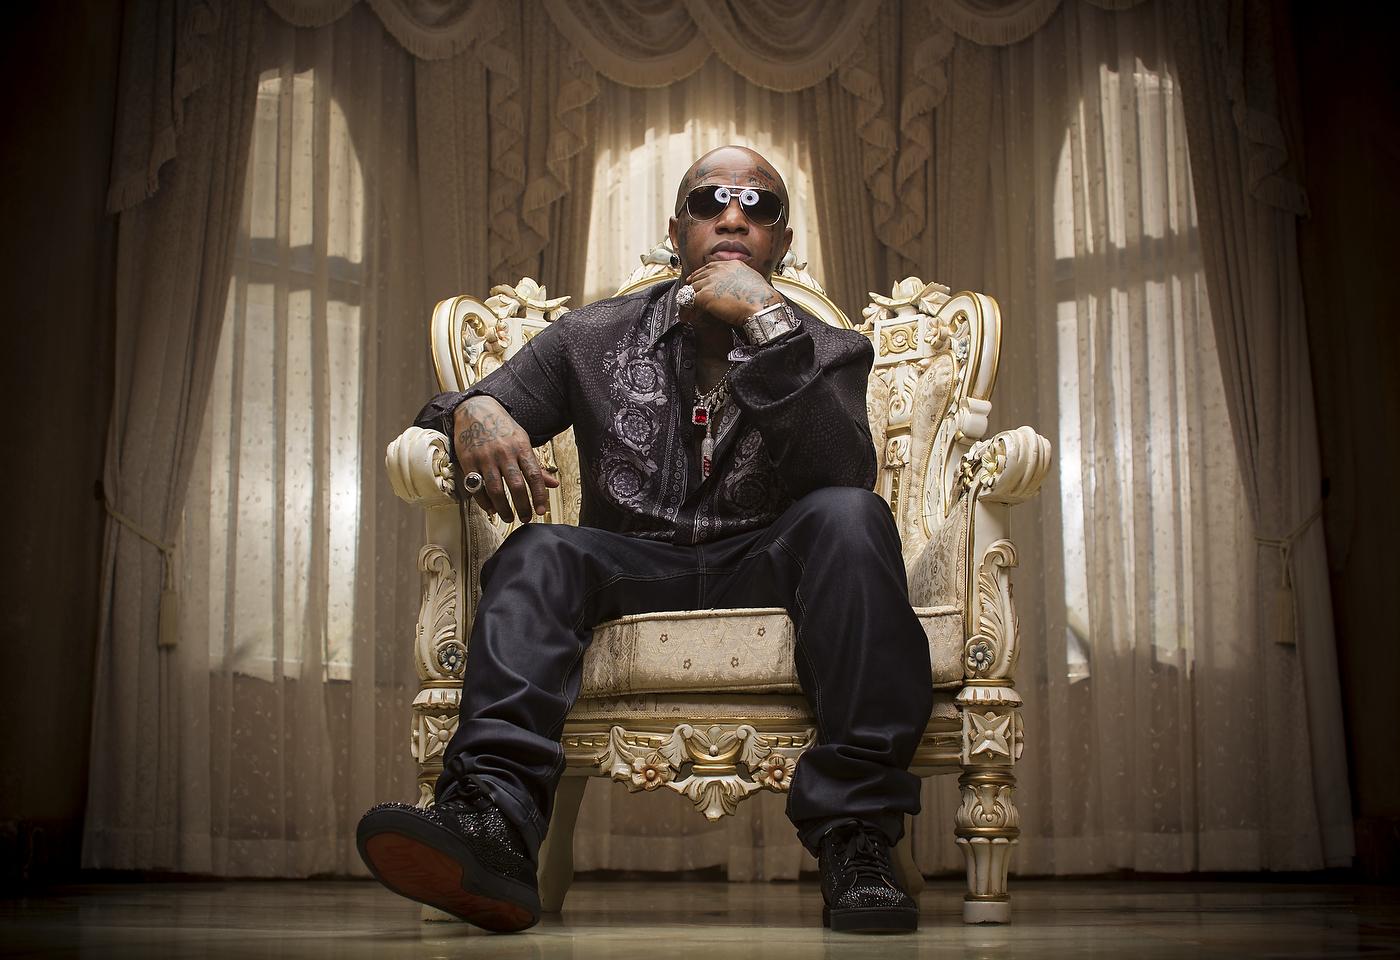 Video Birdman Ft Lil Wayne Nicki Minaj Mack Maine Future Tapout